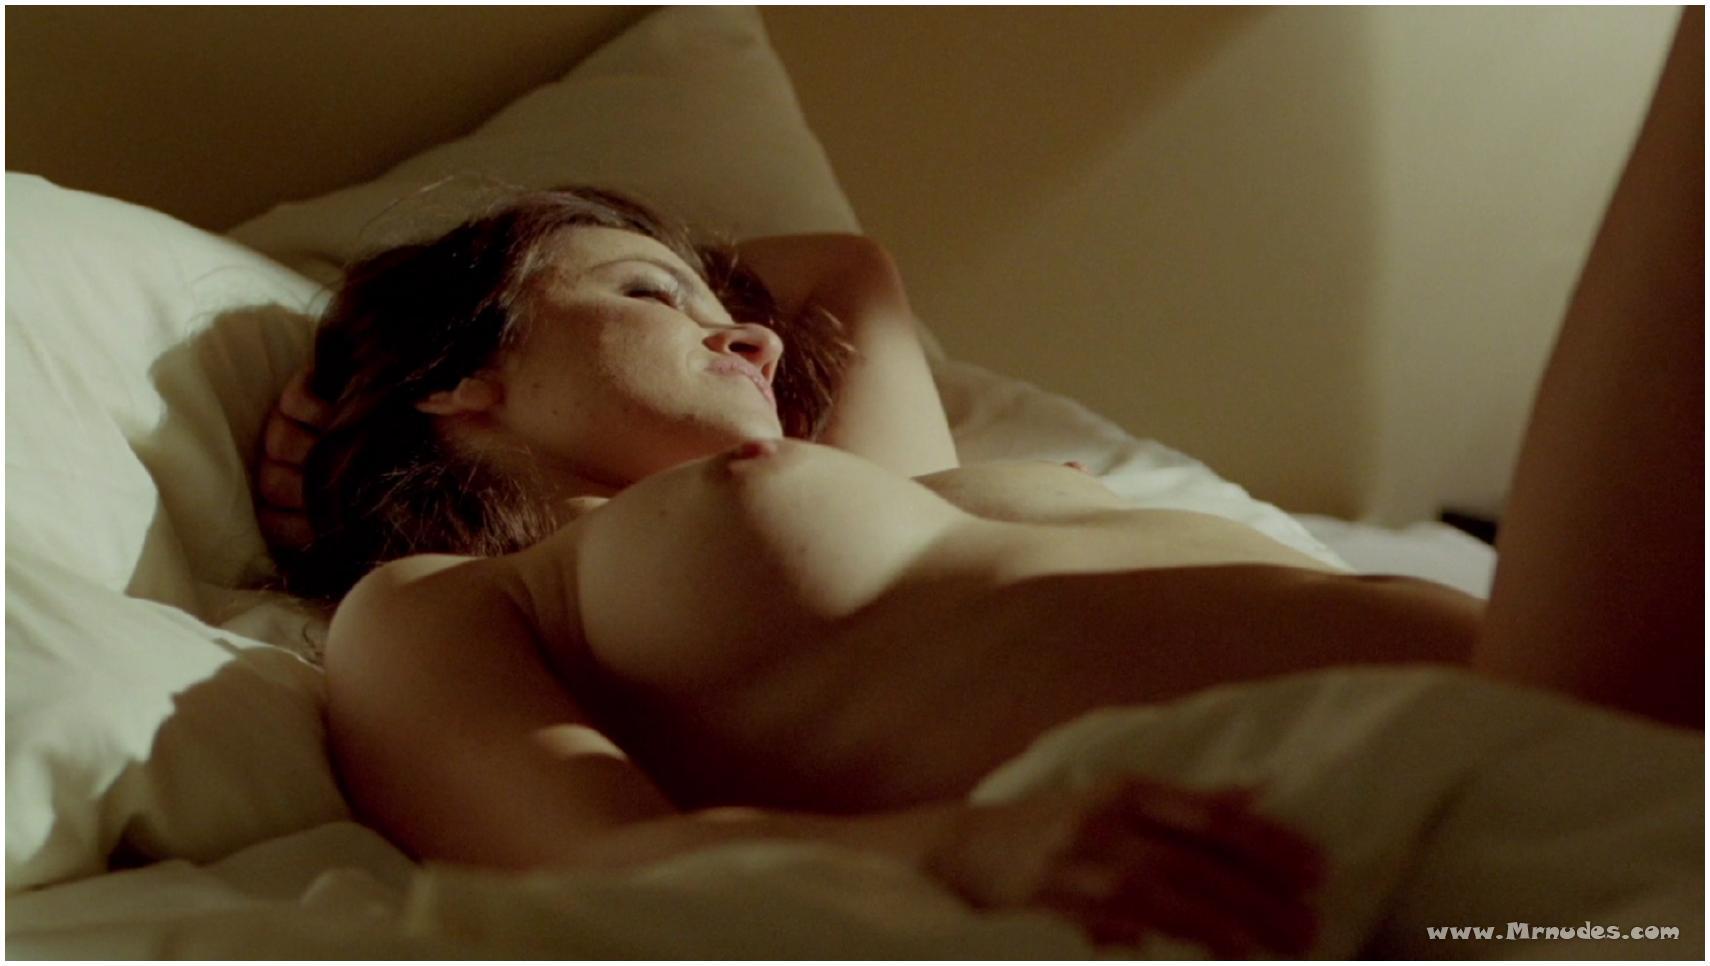 With Natalia avelon nude video final